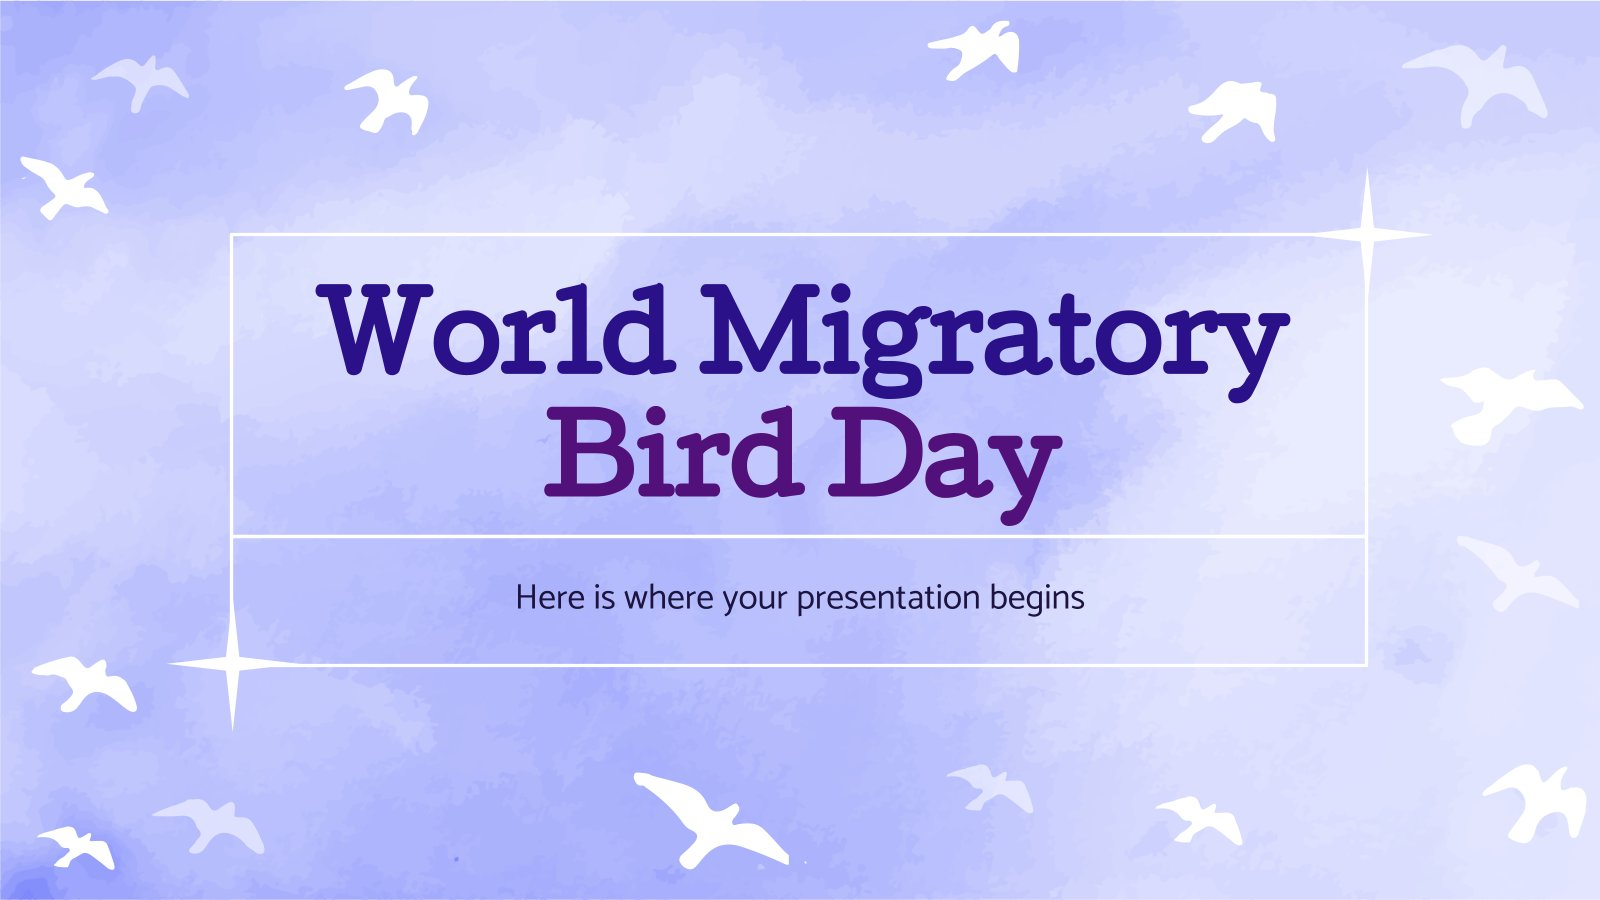 World Migratory Bird Day presentation template